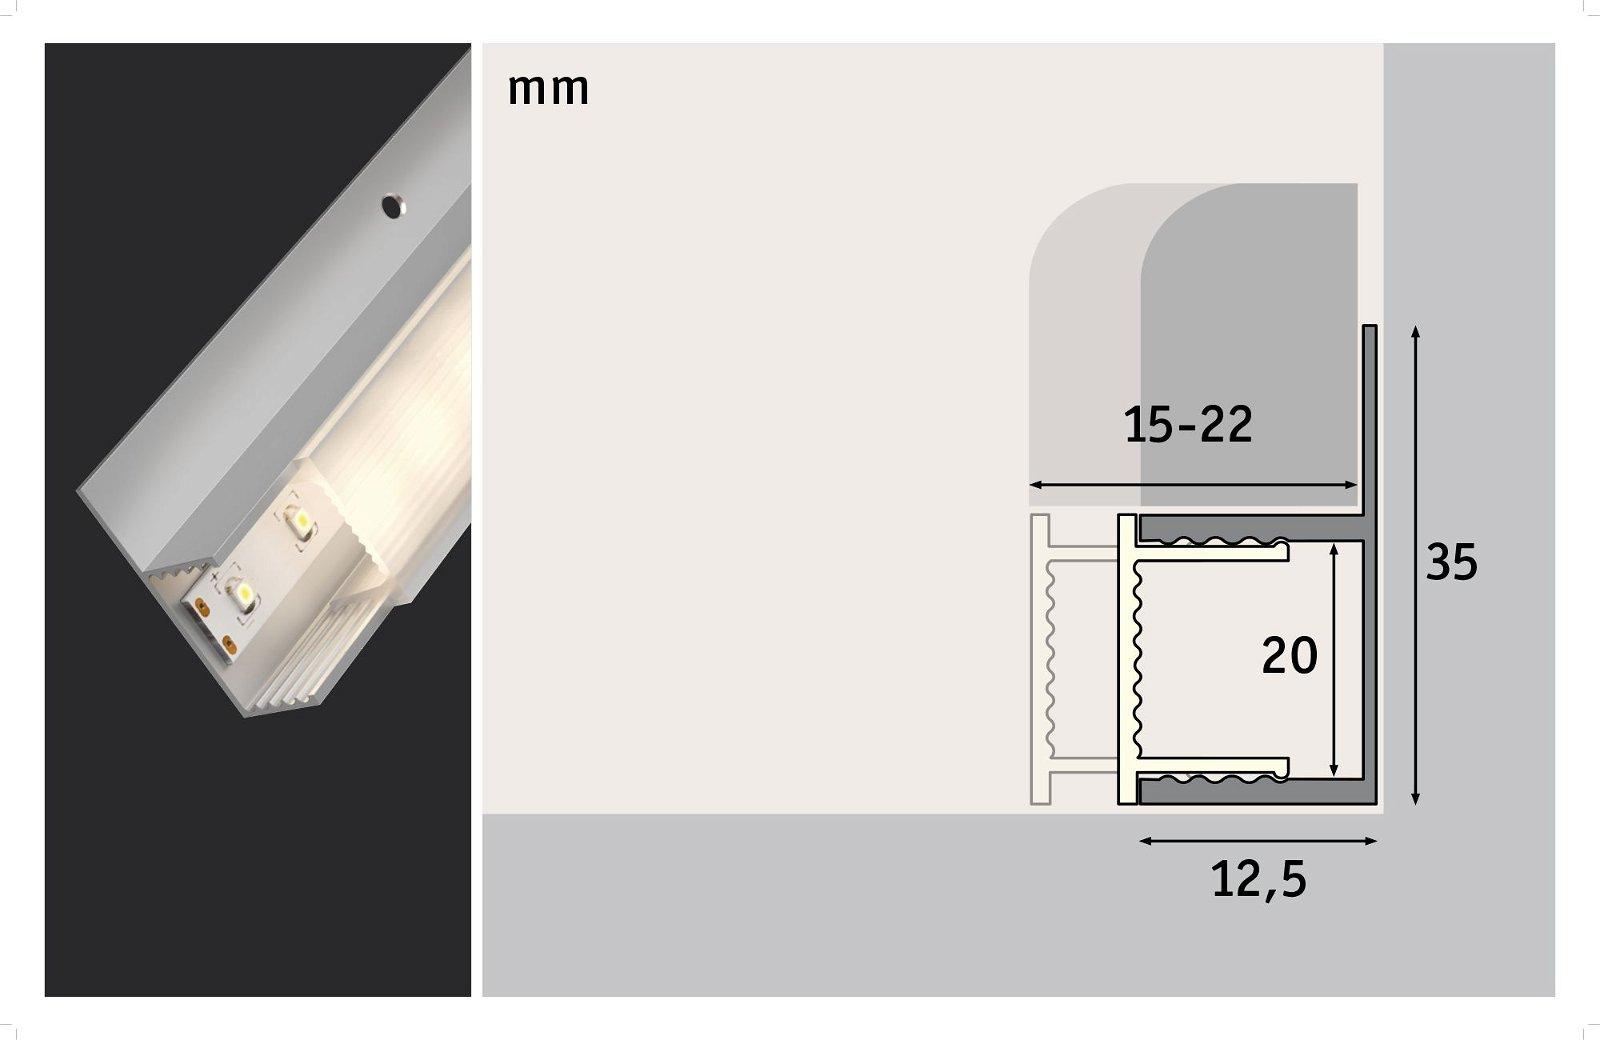 LED Strip Einbauprofil Socle Weißer Diffusor 2m Alu eloxiert/Satin